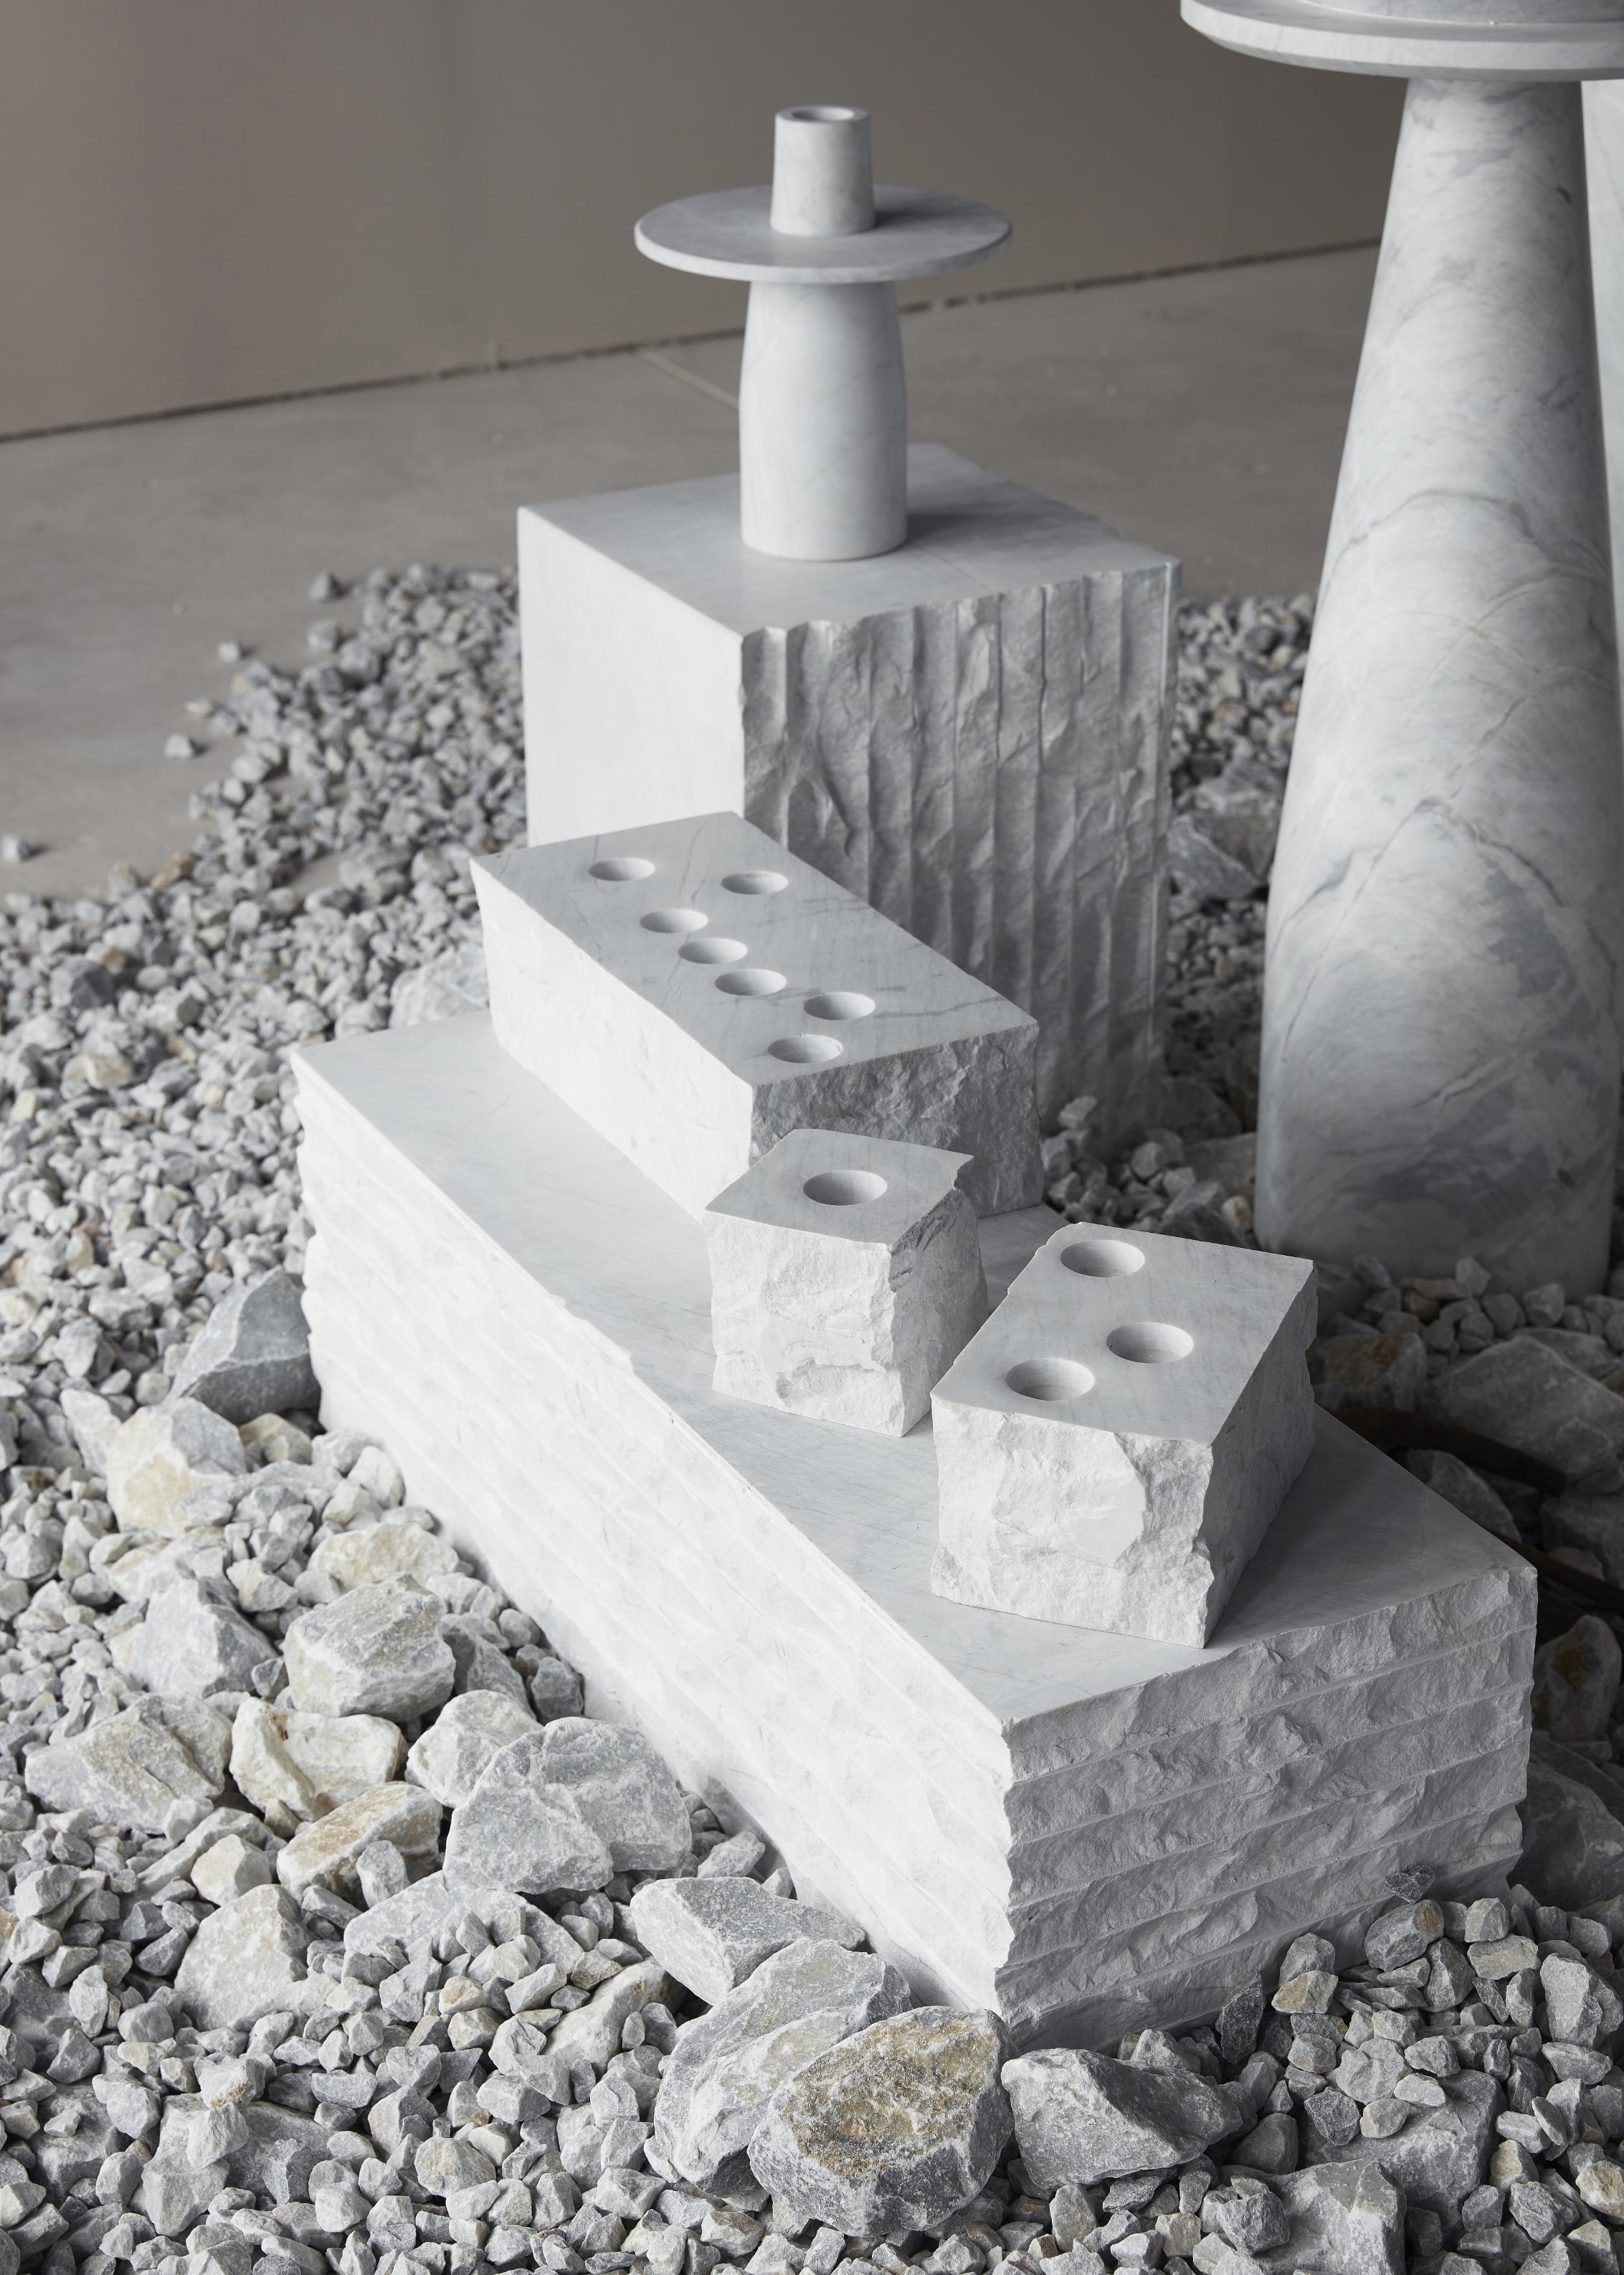 New Volumes™ ℅ Artedomus, An Installation By Fiona Lynch And Thomas Coward Min